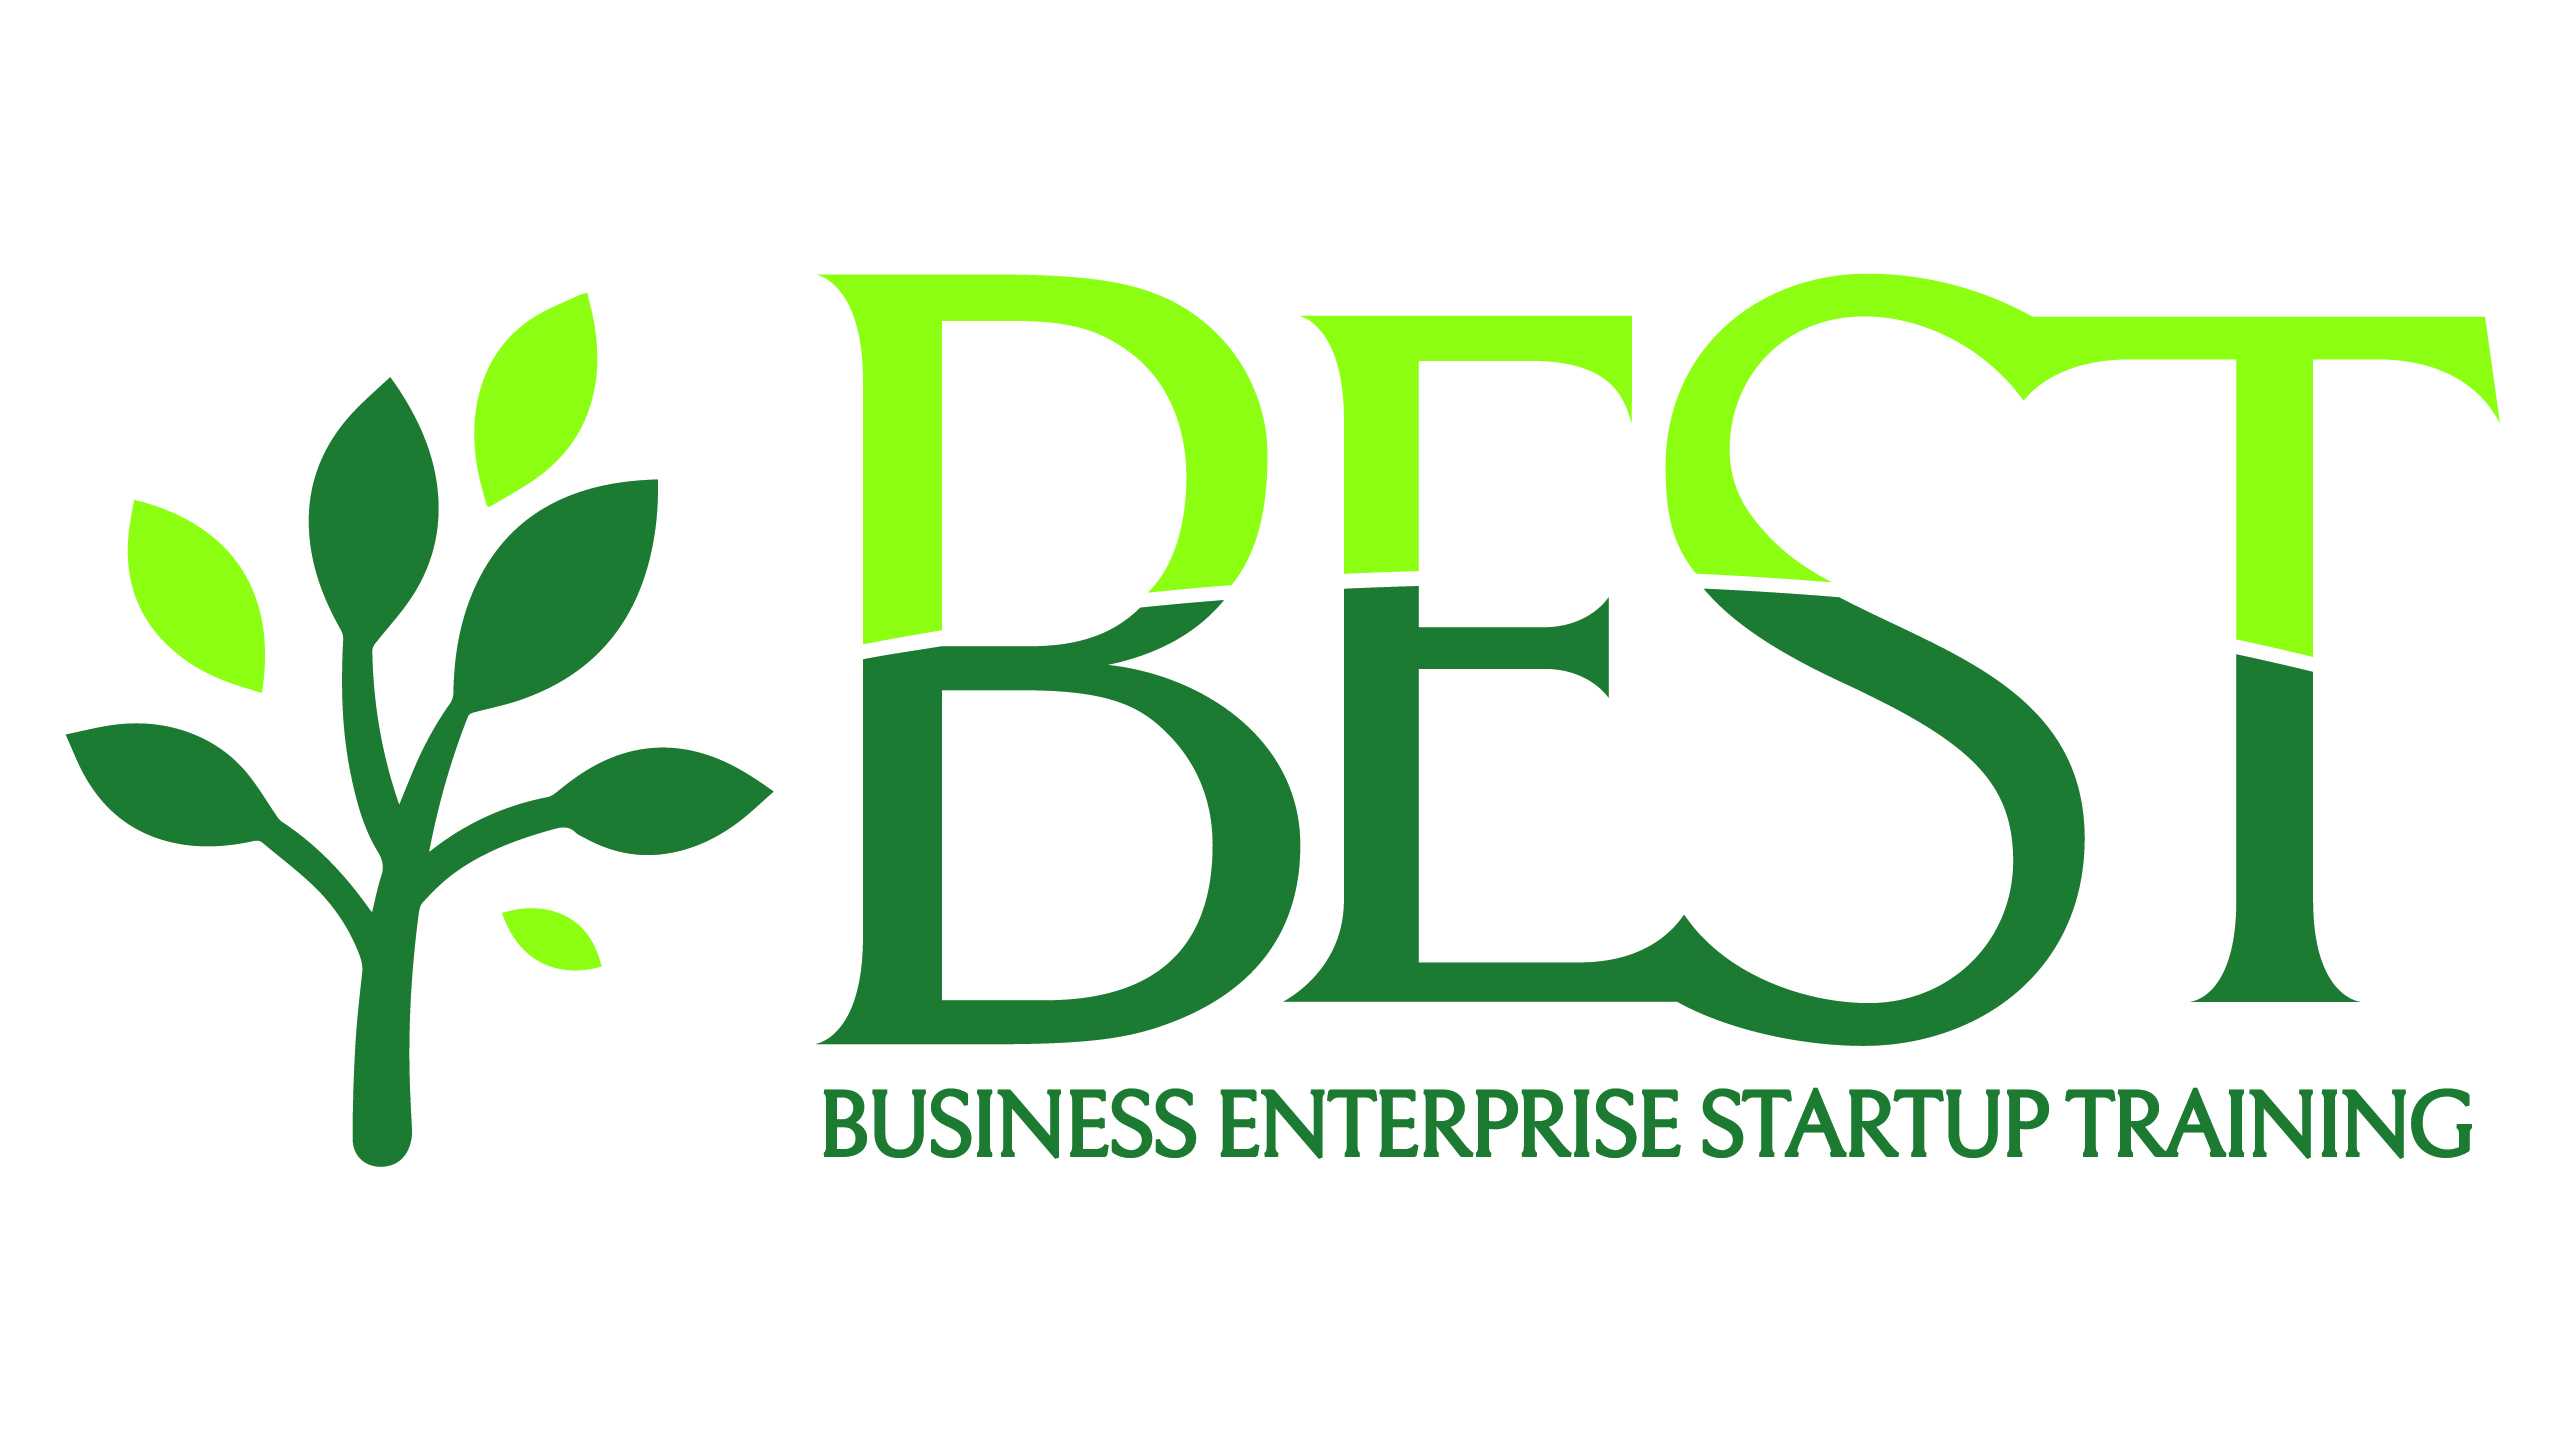 Business Enterprise Startup Training (BEST)-Business Plan Writing for Startups